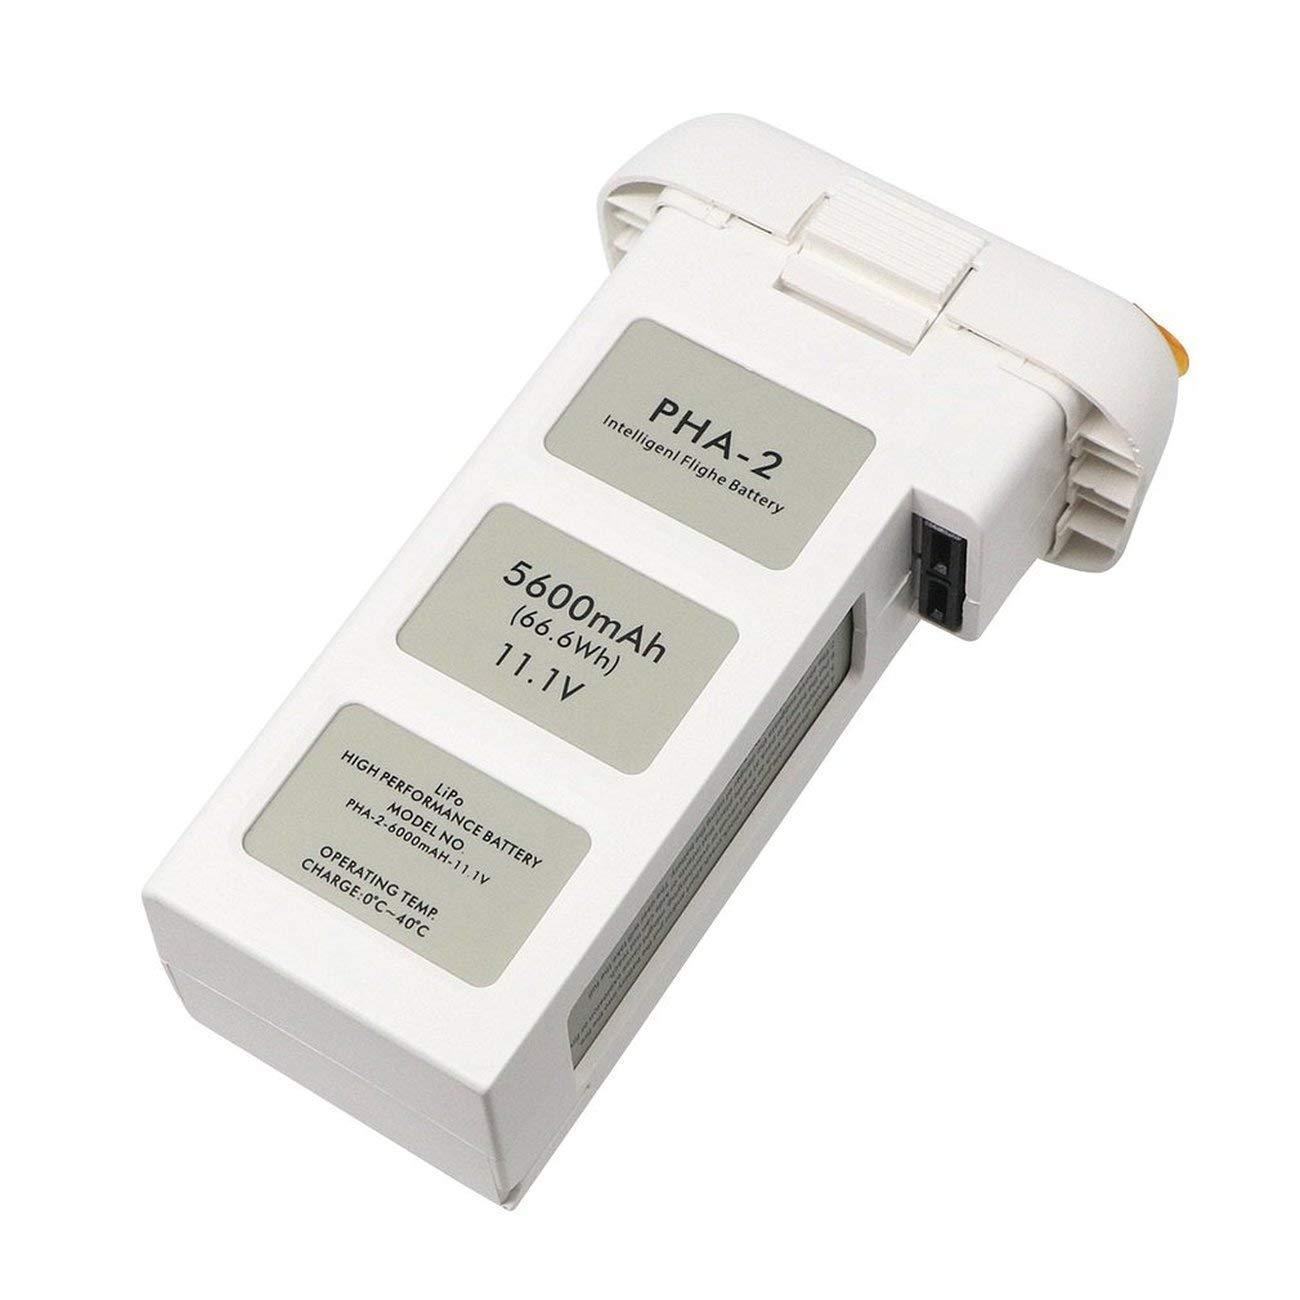 Jiobapiongxin 5600mAh intelligente Flugbatterie für DJI Phantom 2 2 2 für DJI Phantom 2 Vision + 25d52b